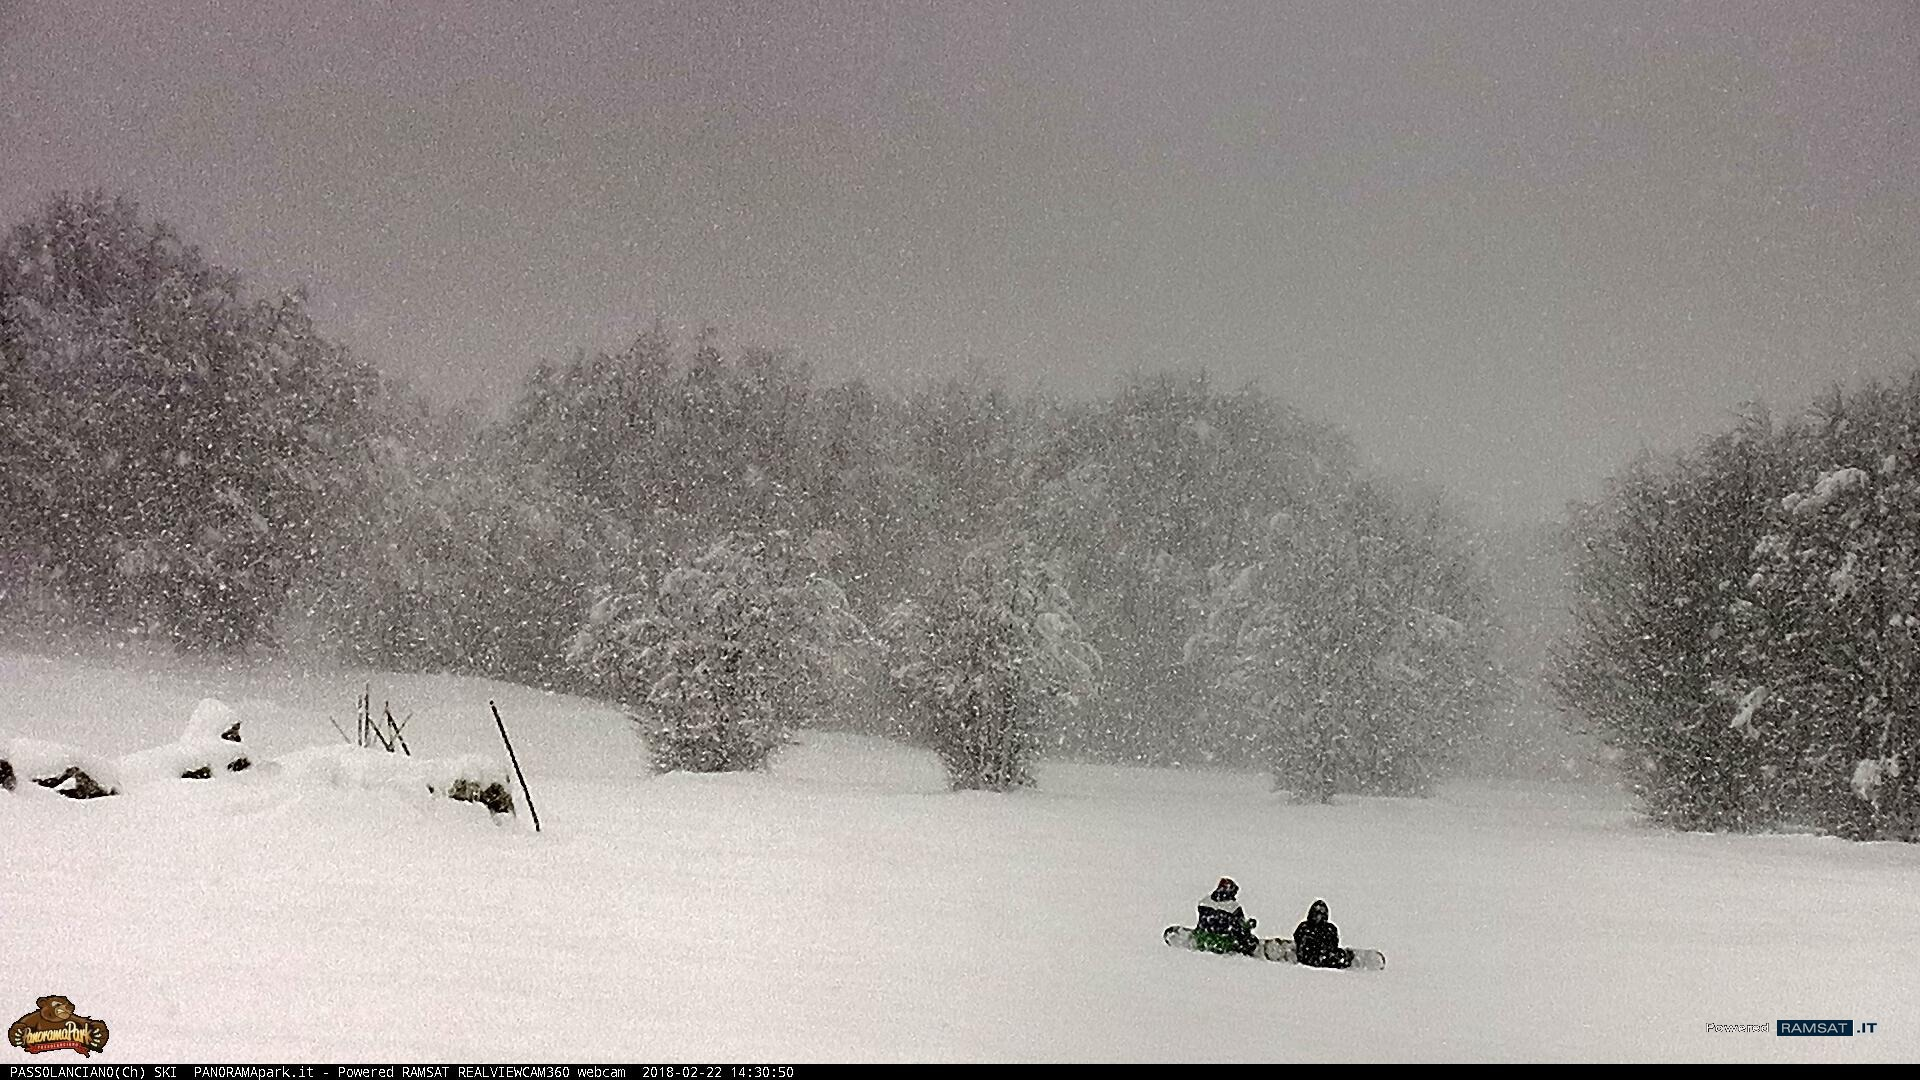 Appennini inverno 2017-2018-panoramapark_01.jpg